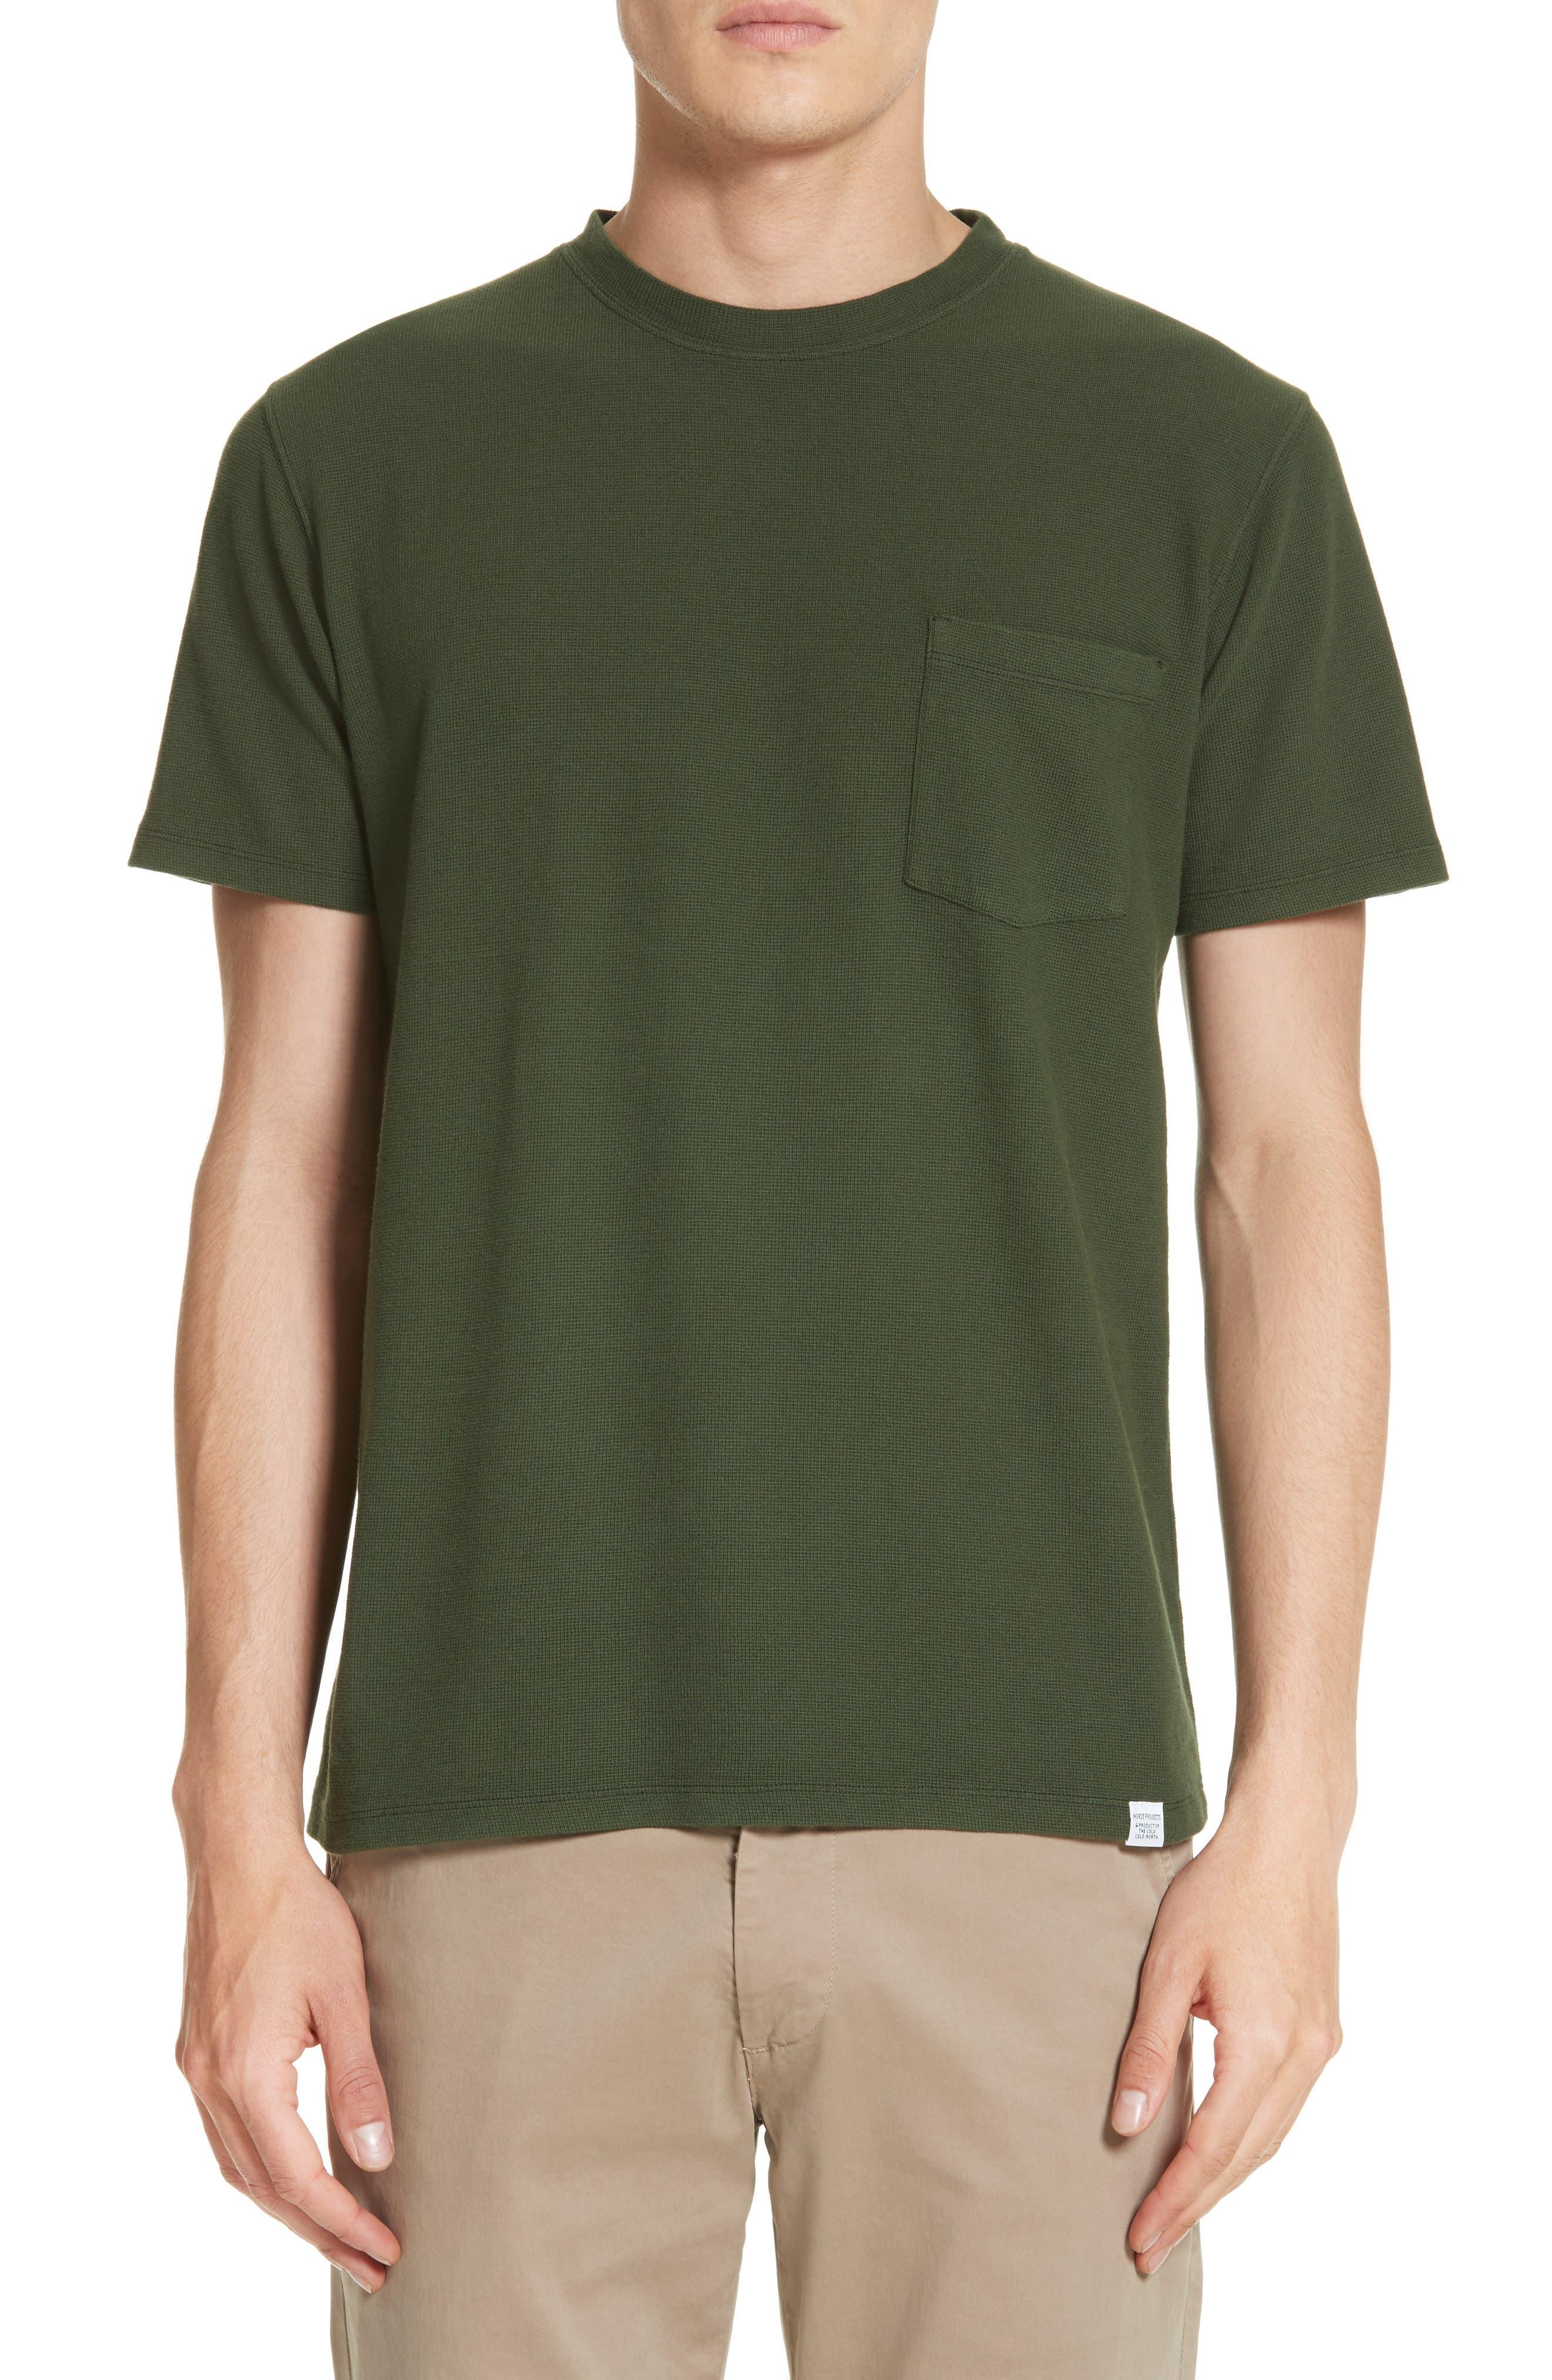 Niels Garment Dye T-Shirt,                         Main,                         color, Forest Green